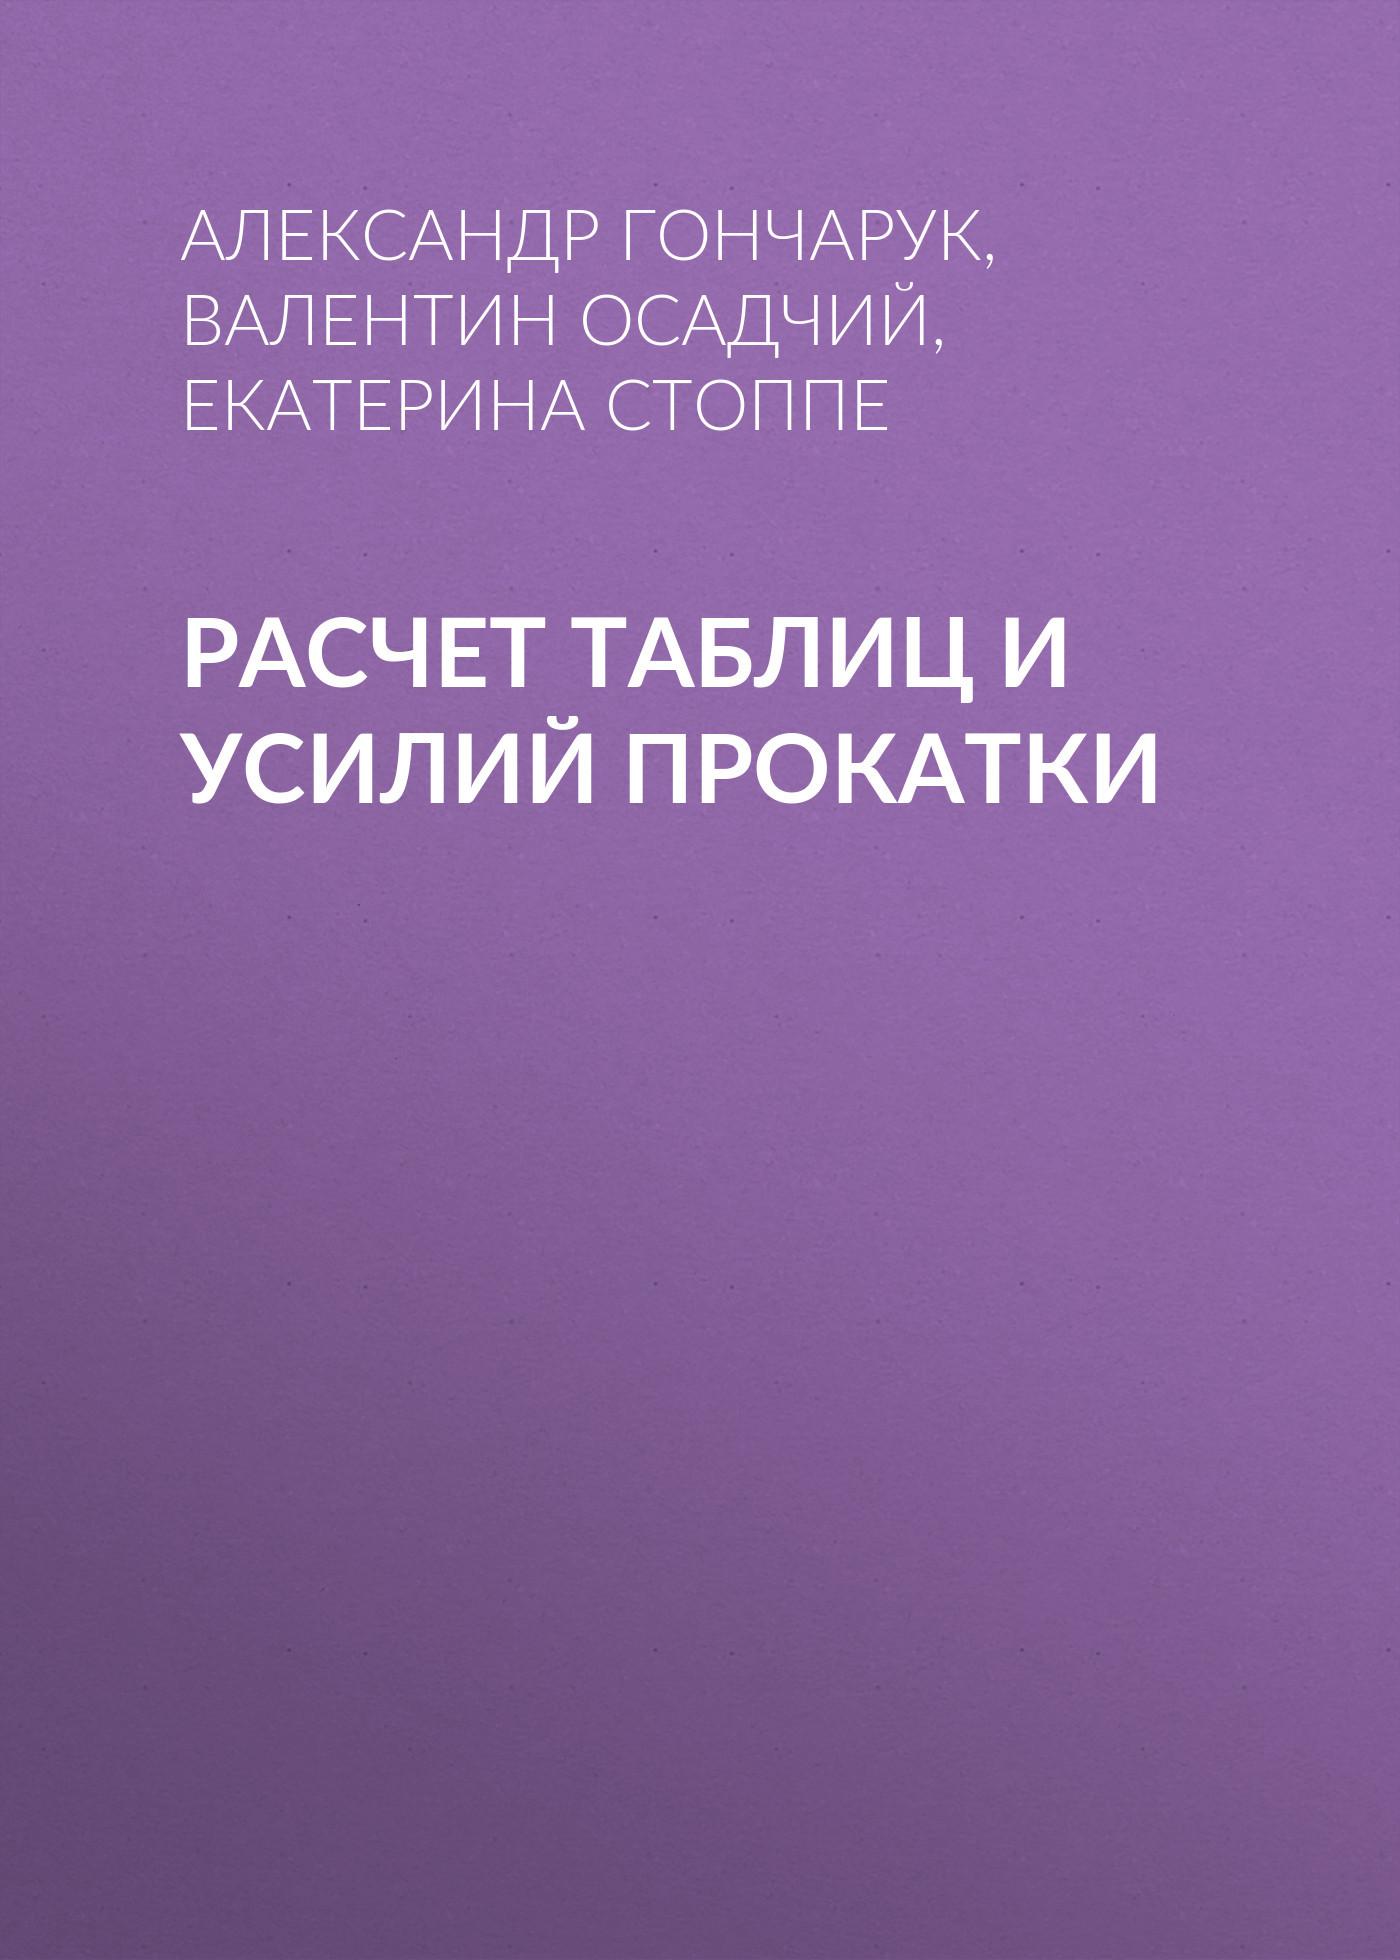 Валентин Осадчий. Расчет таблиц и усилий прокатки